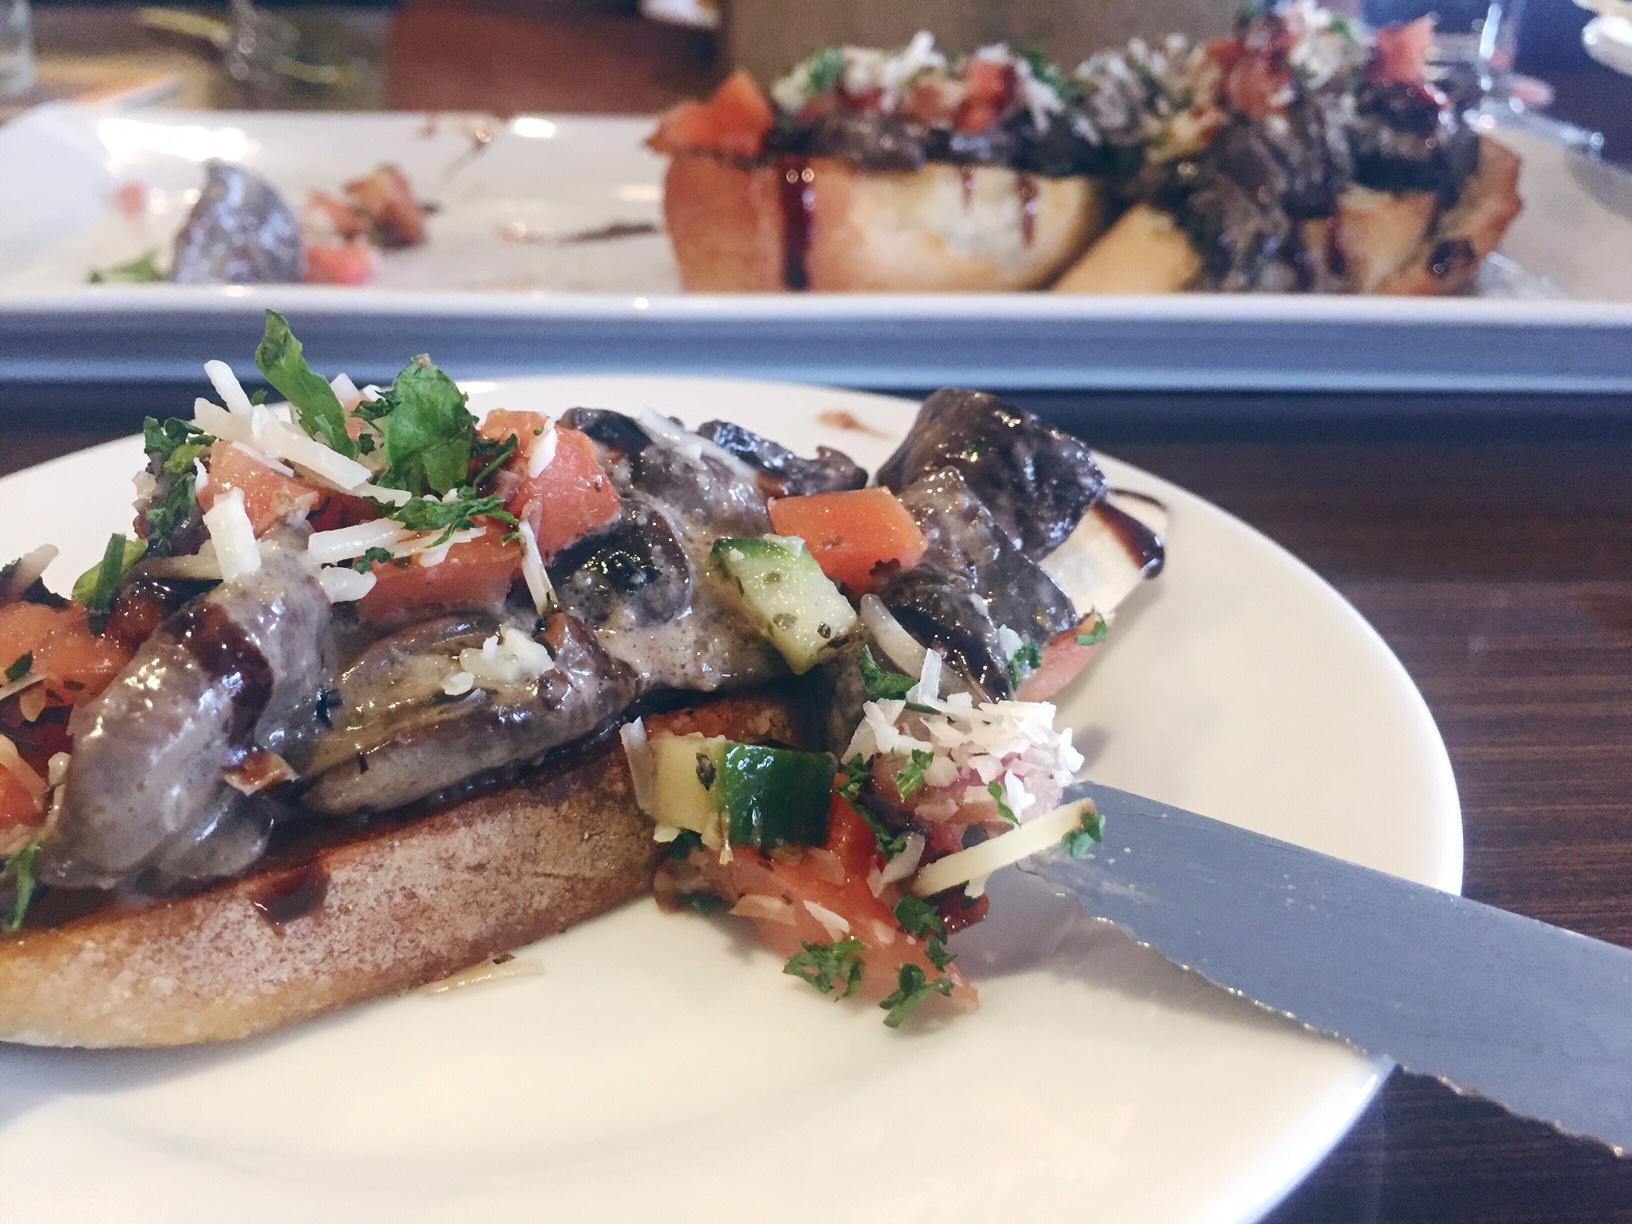 Locals Get the Best Barbecue Deals at Dox Restaurant